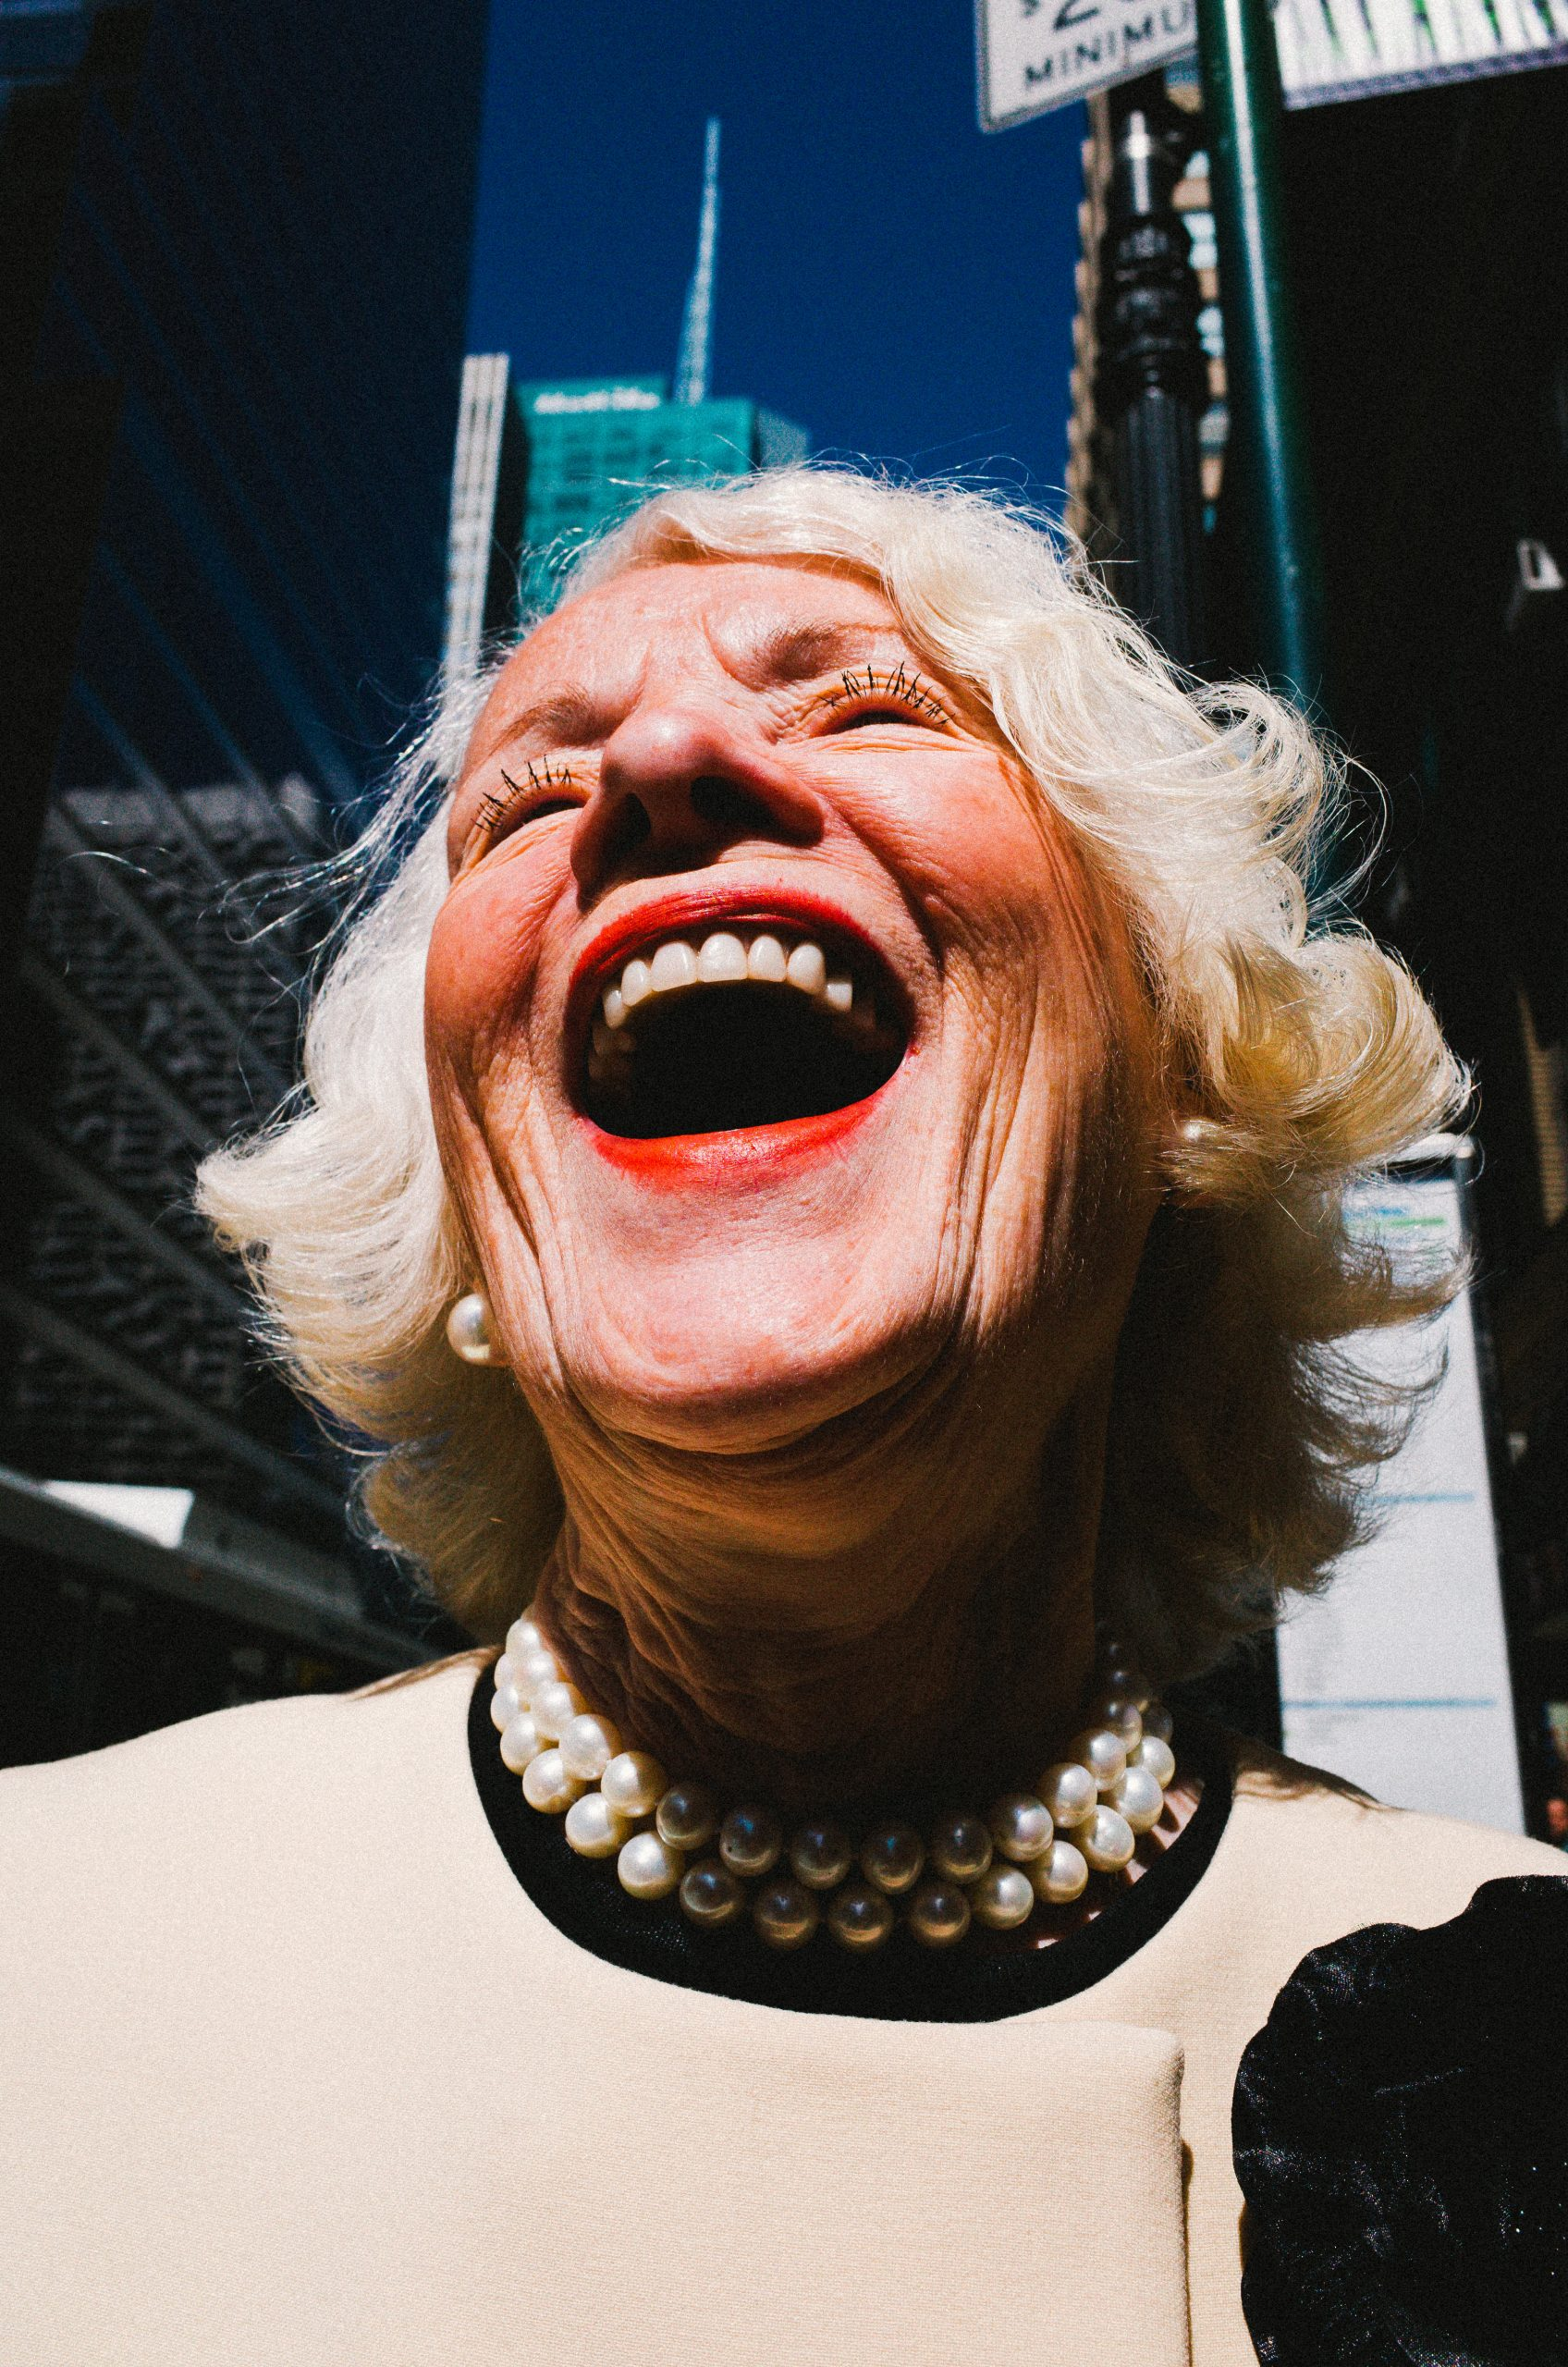 ERIC KIM laughing lady white hair red lips blue sky New York City street portrait Ricoh gr ii macro mode 28mm